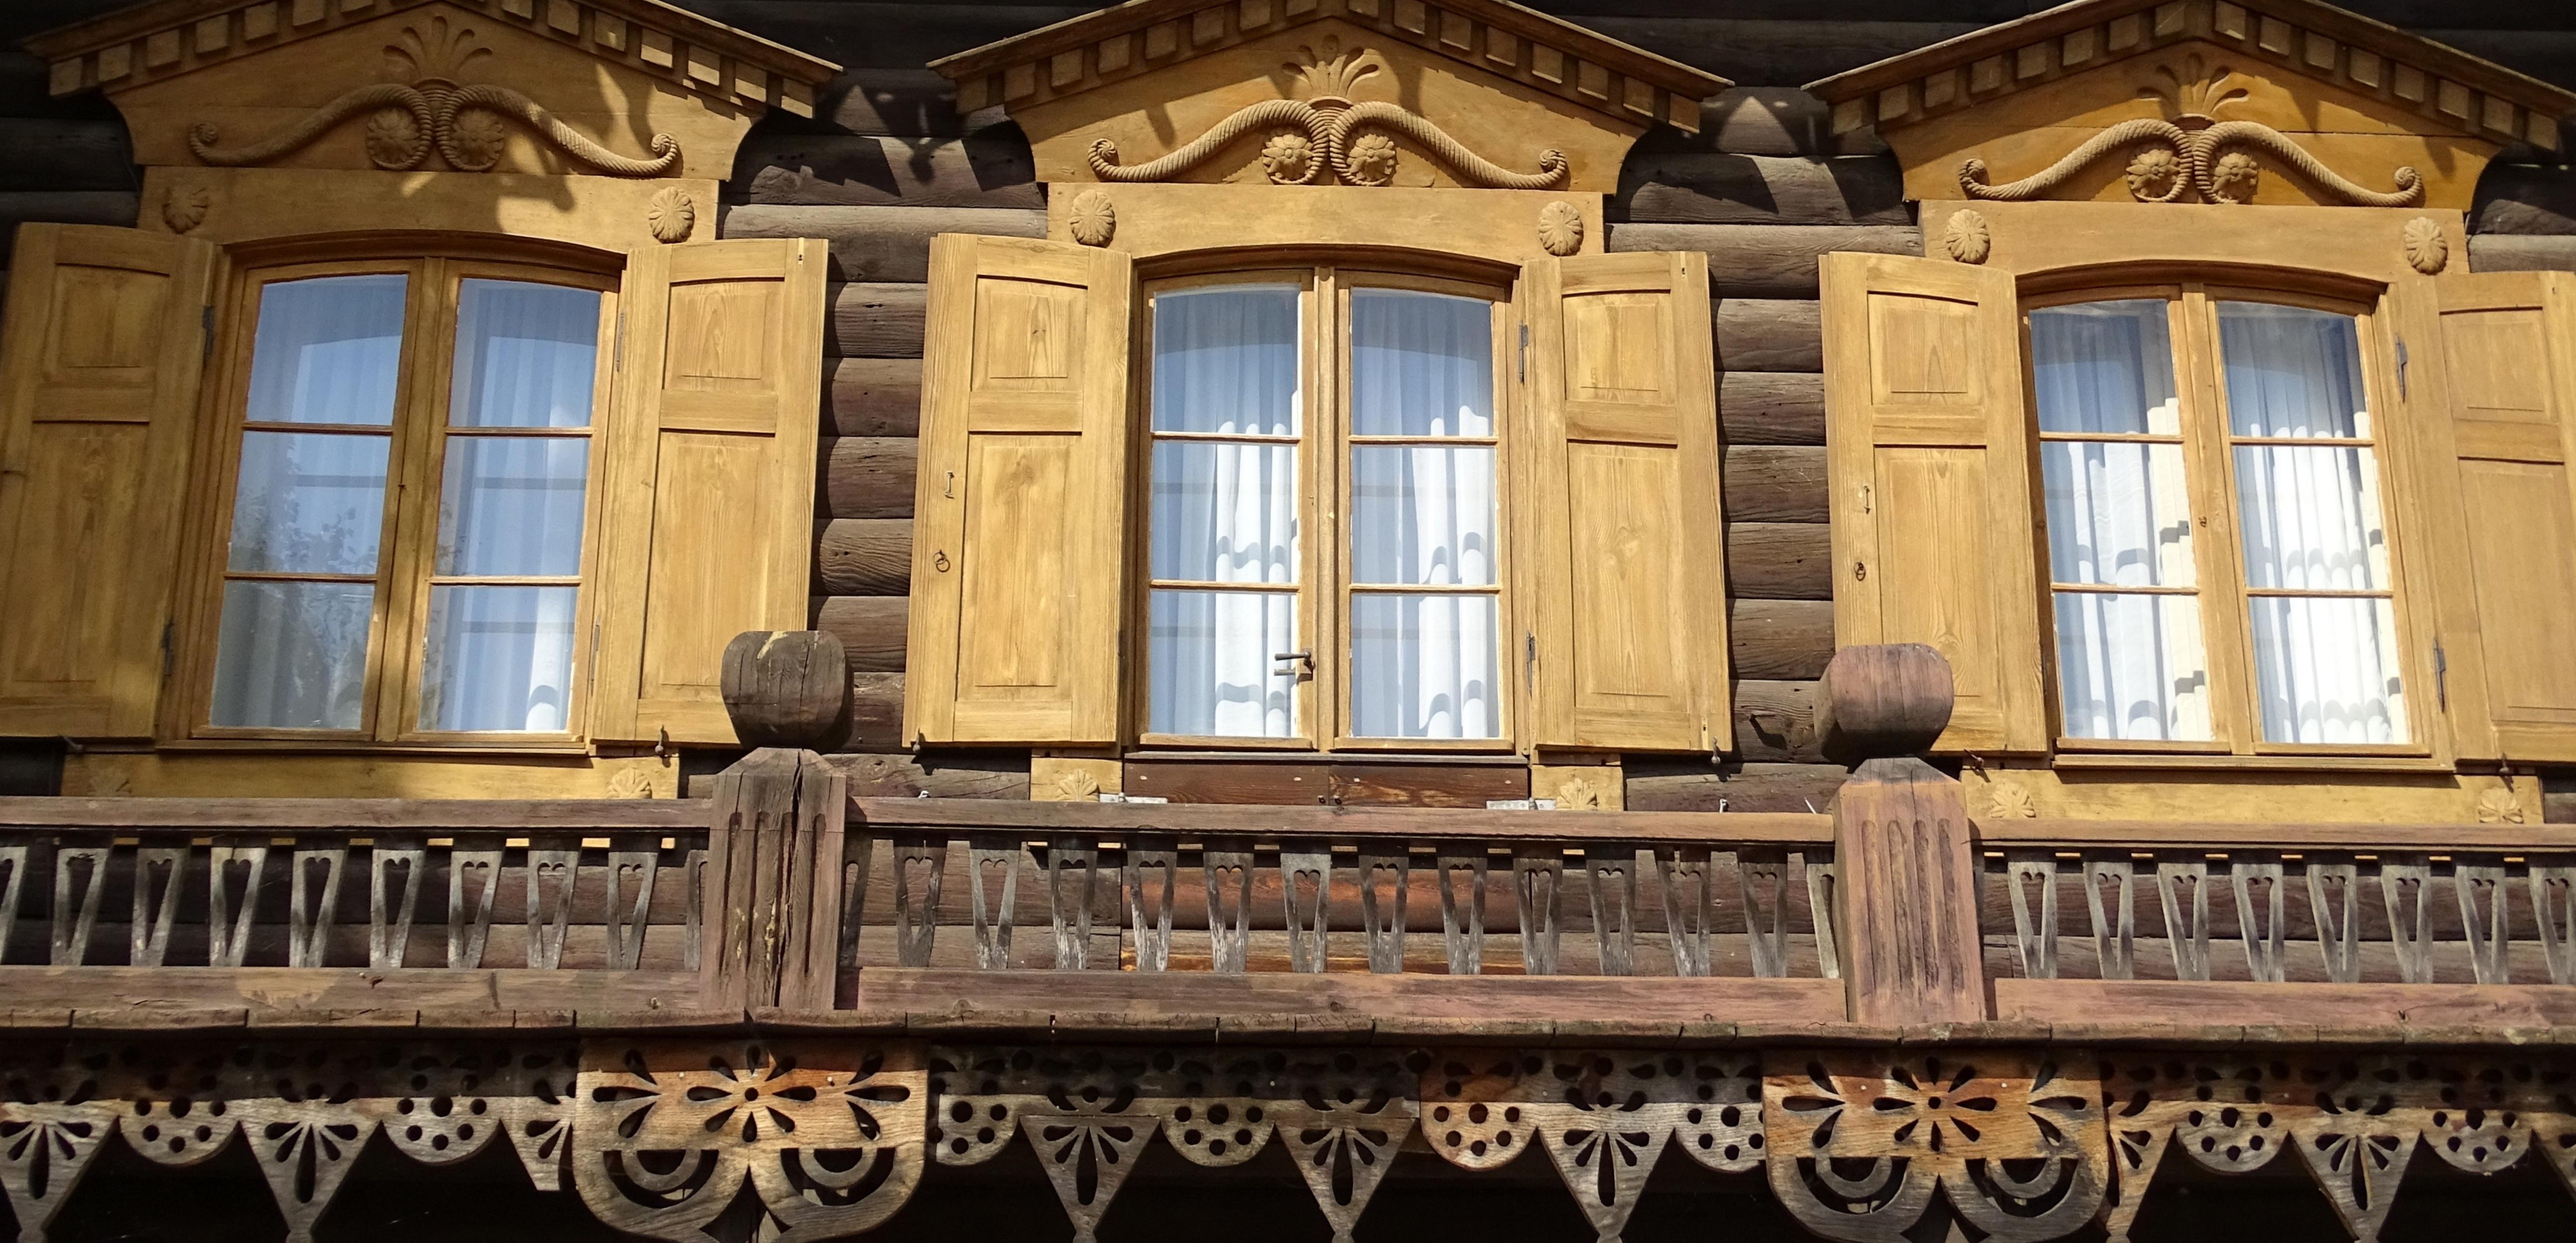 Aleksandrovka: a selection of sites